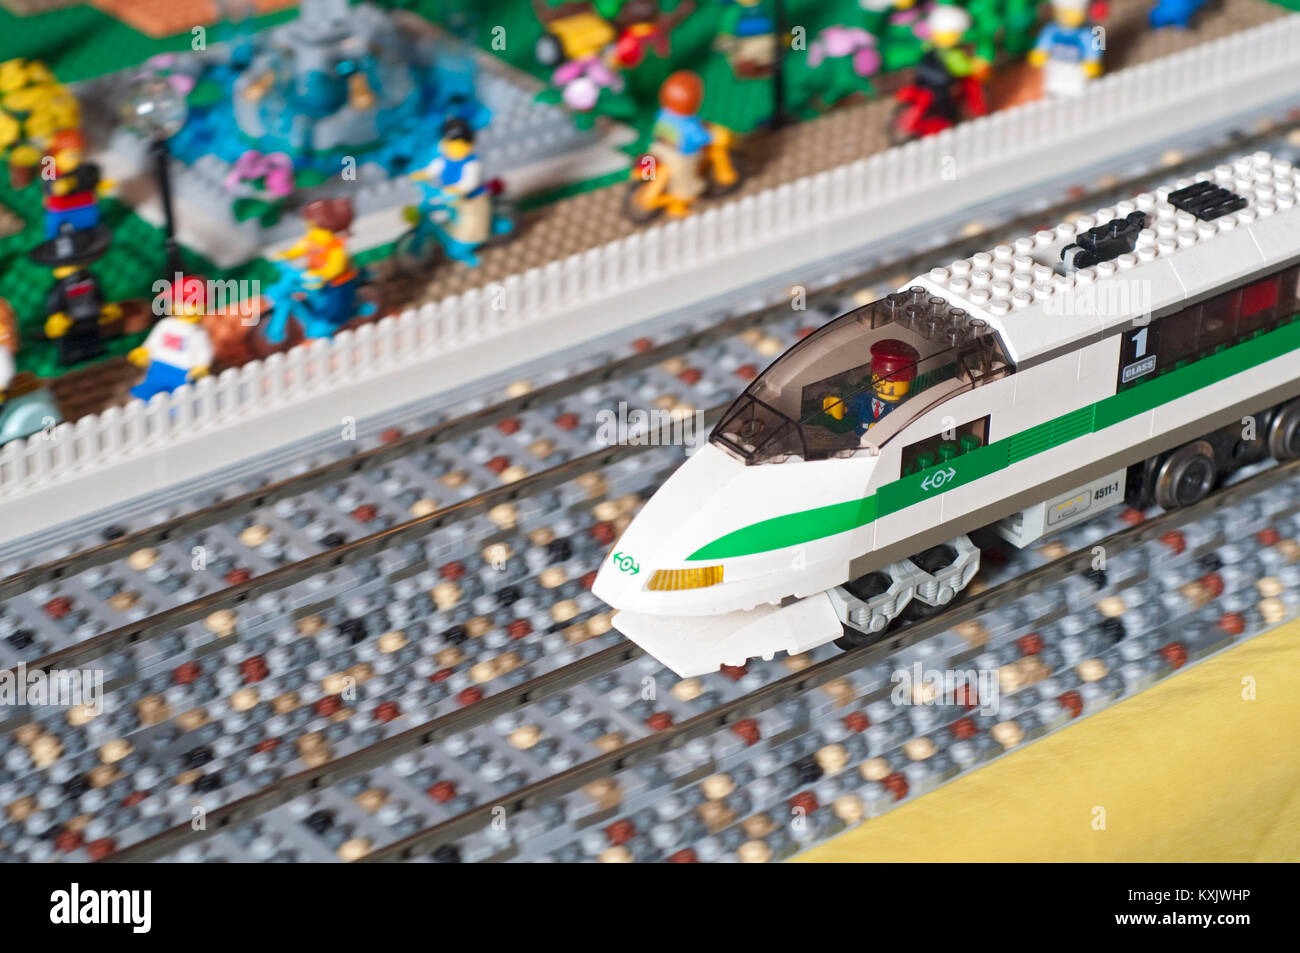 Lego Train Set Stock Photos Lego Train Set Stock Images Alamy